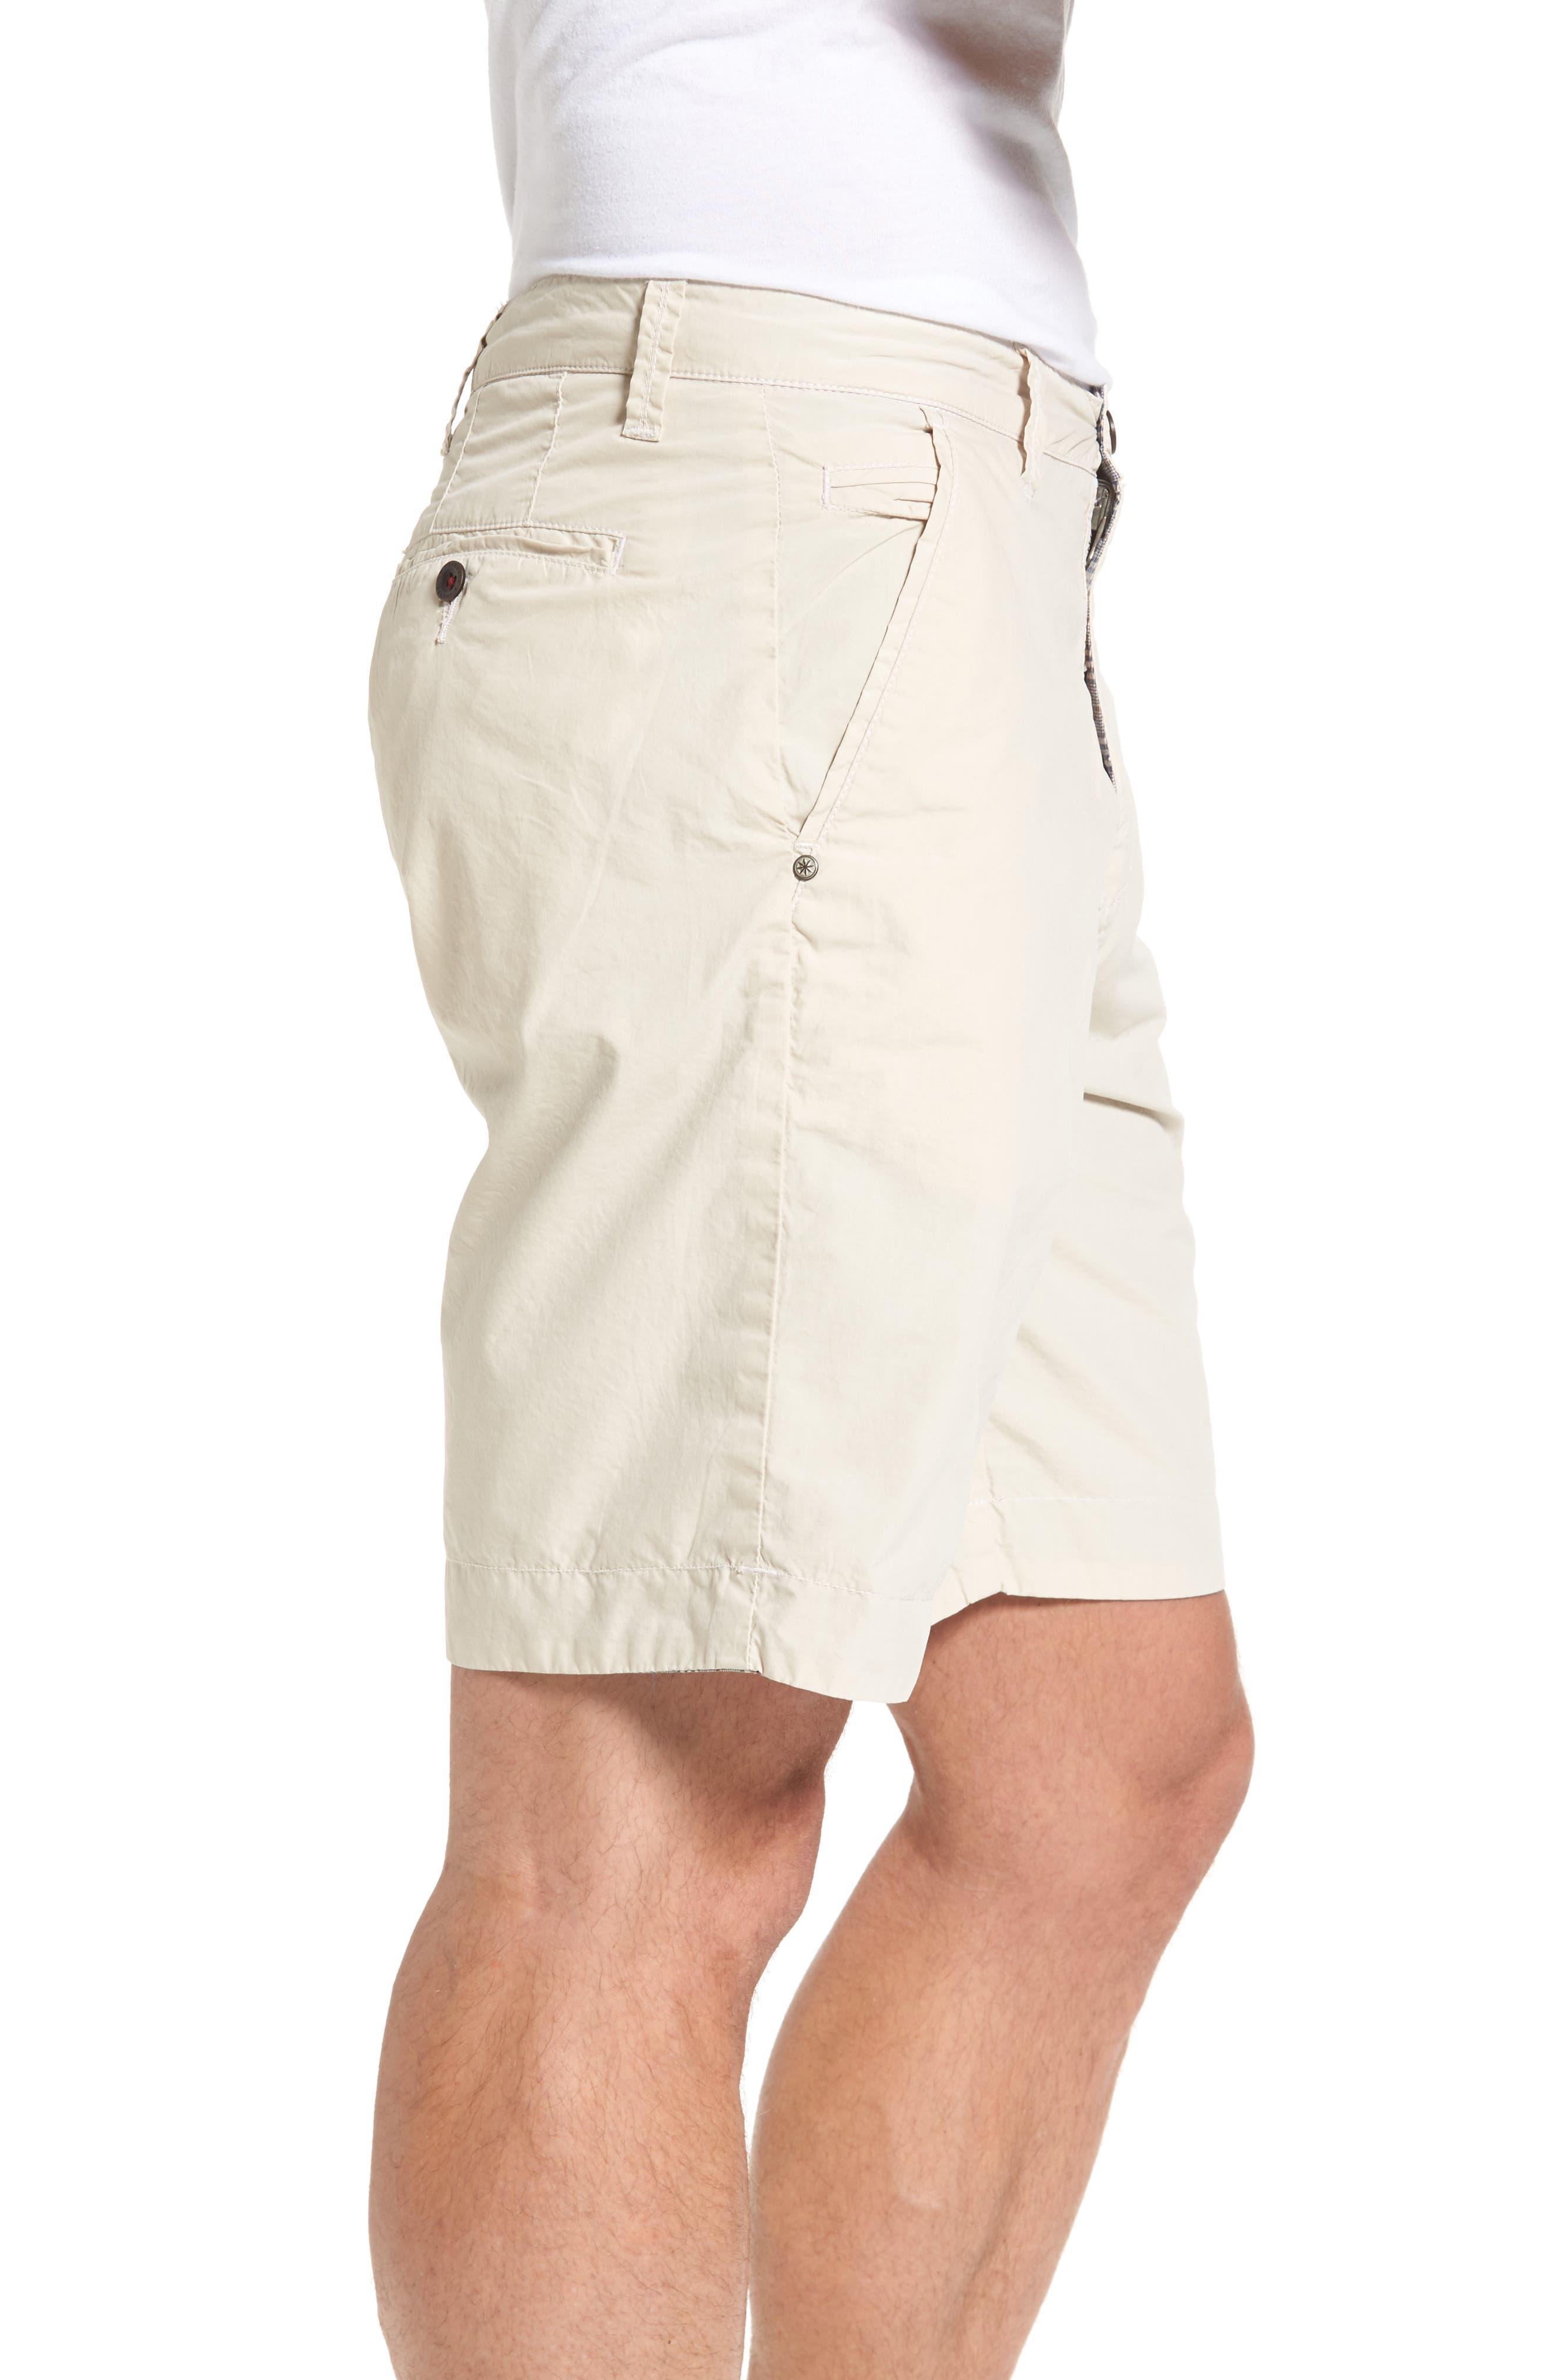 Darlington Reversible Flat Front Shorts,                             Alternate thumbnail 3, color,                             290